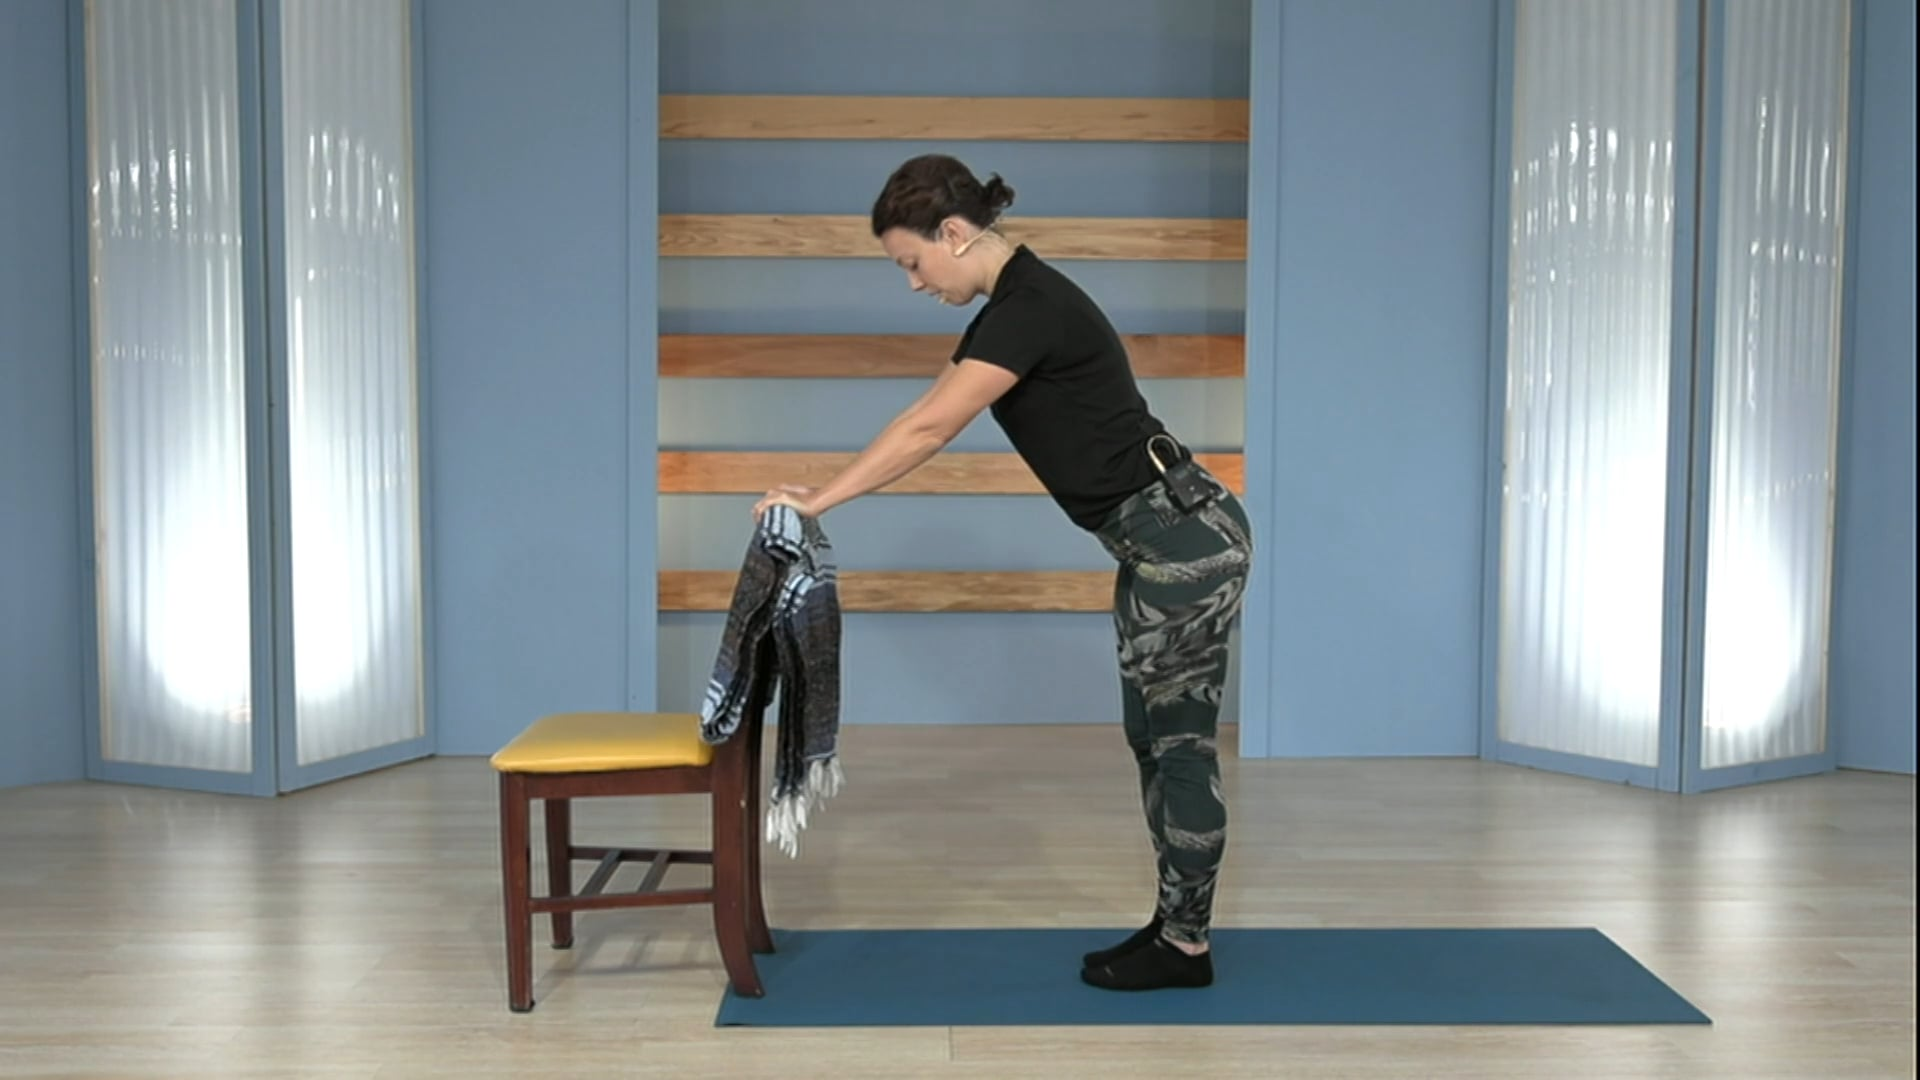 Posture and Balance: Physical Habits